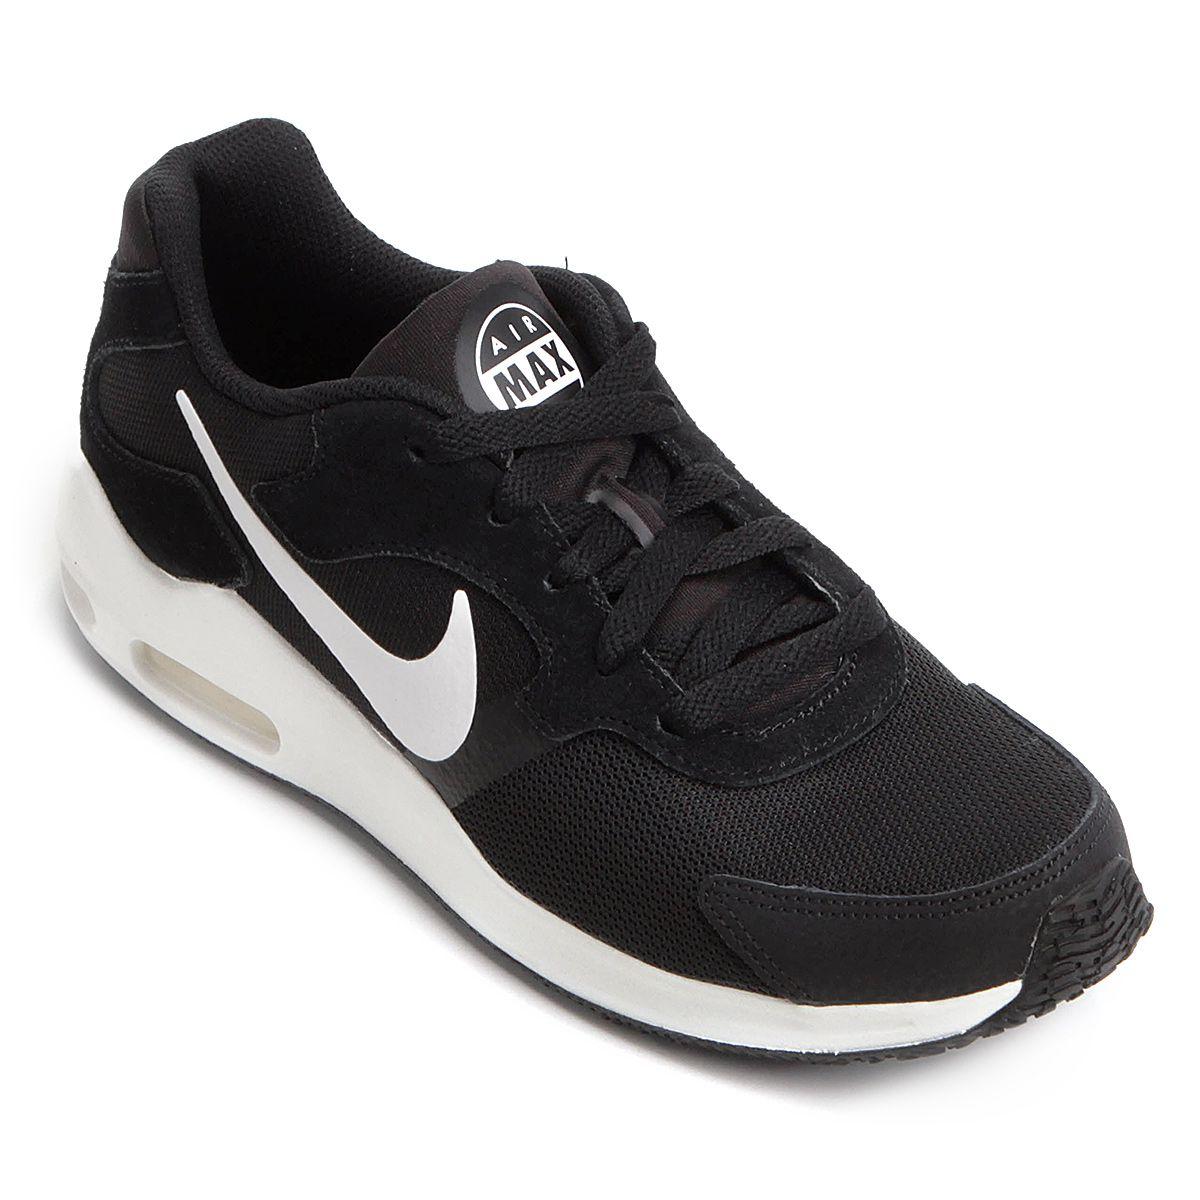 Tênis Nike Air Max Guile Masculino - Preto/Branco